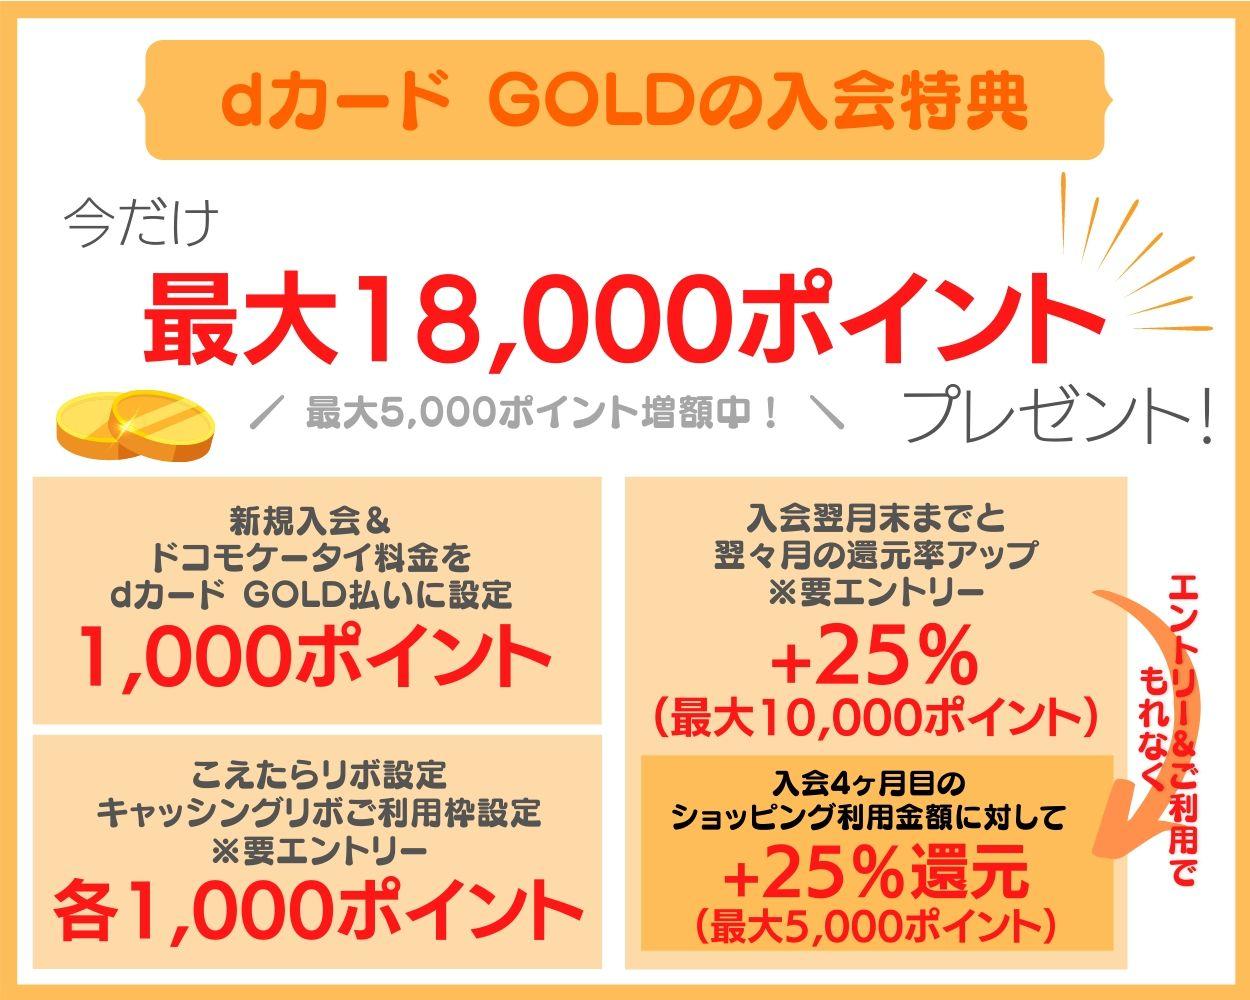 dカード GOLDの入会特典も激アツ!